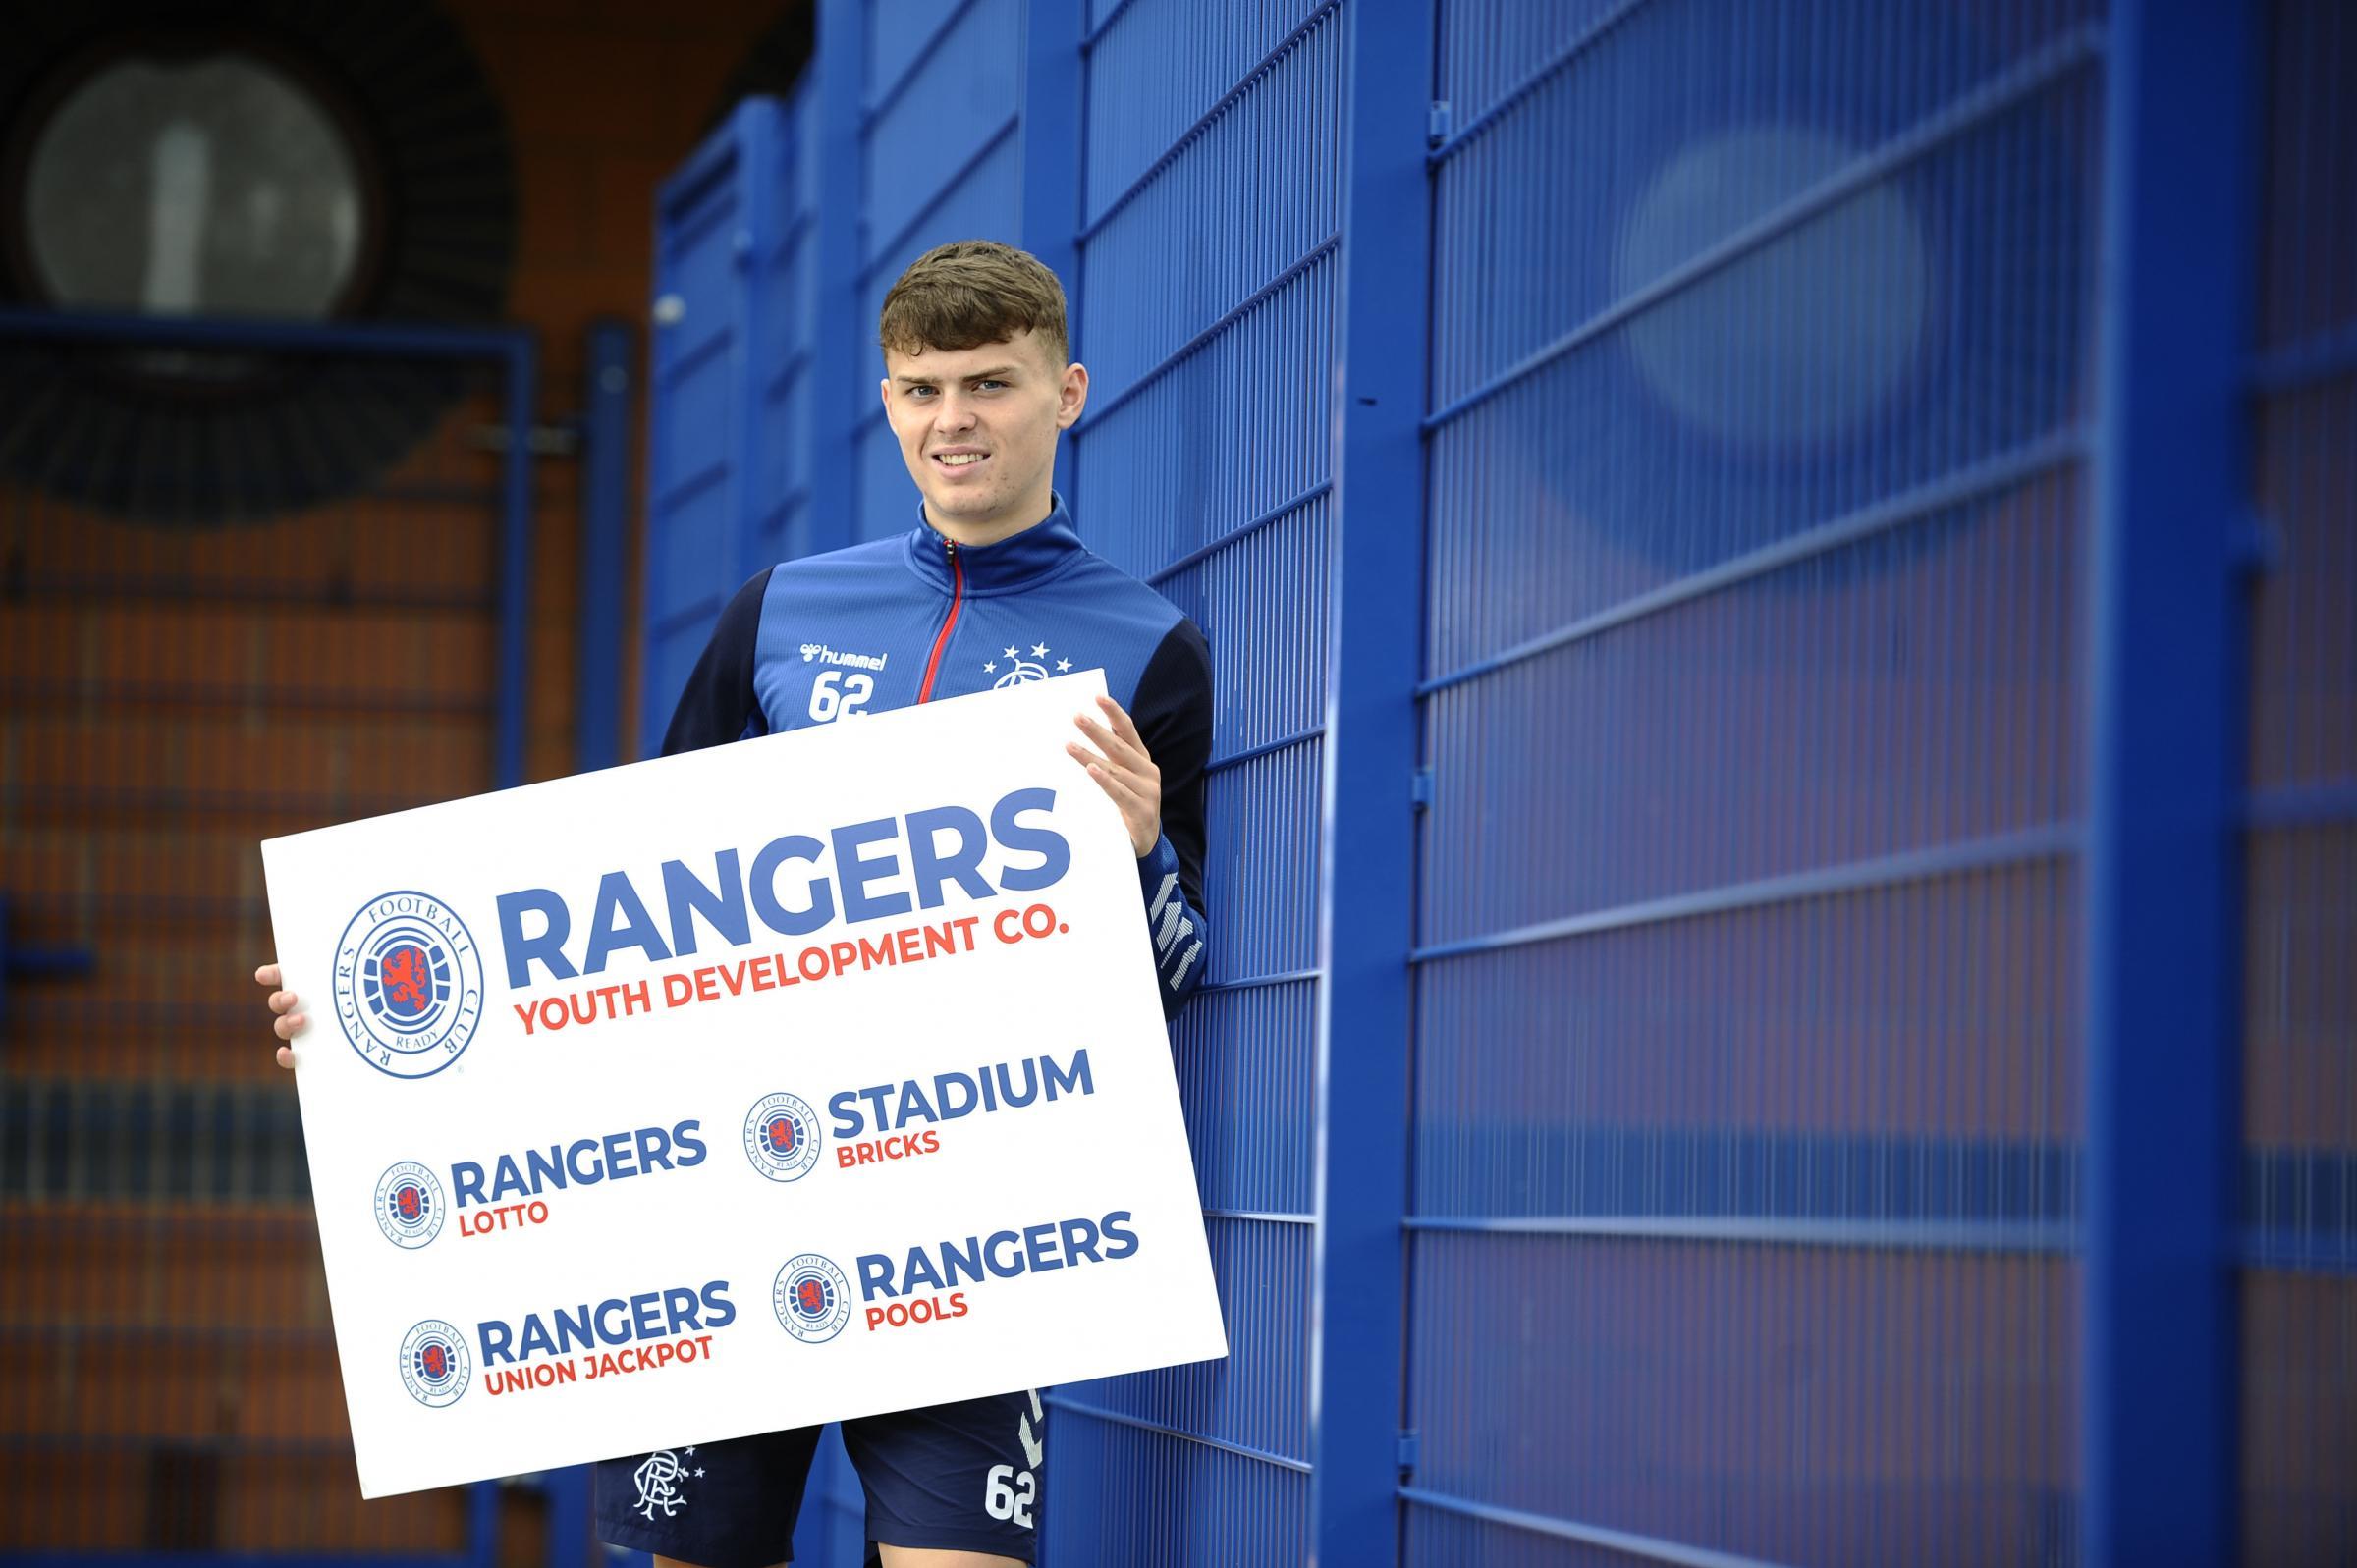 Rangers' Josh McPake savours dream summer as he signs Ibrox deal